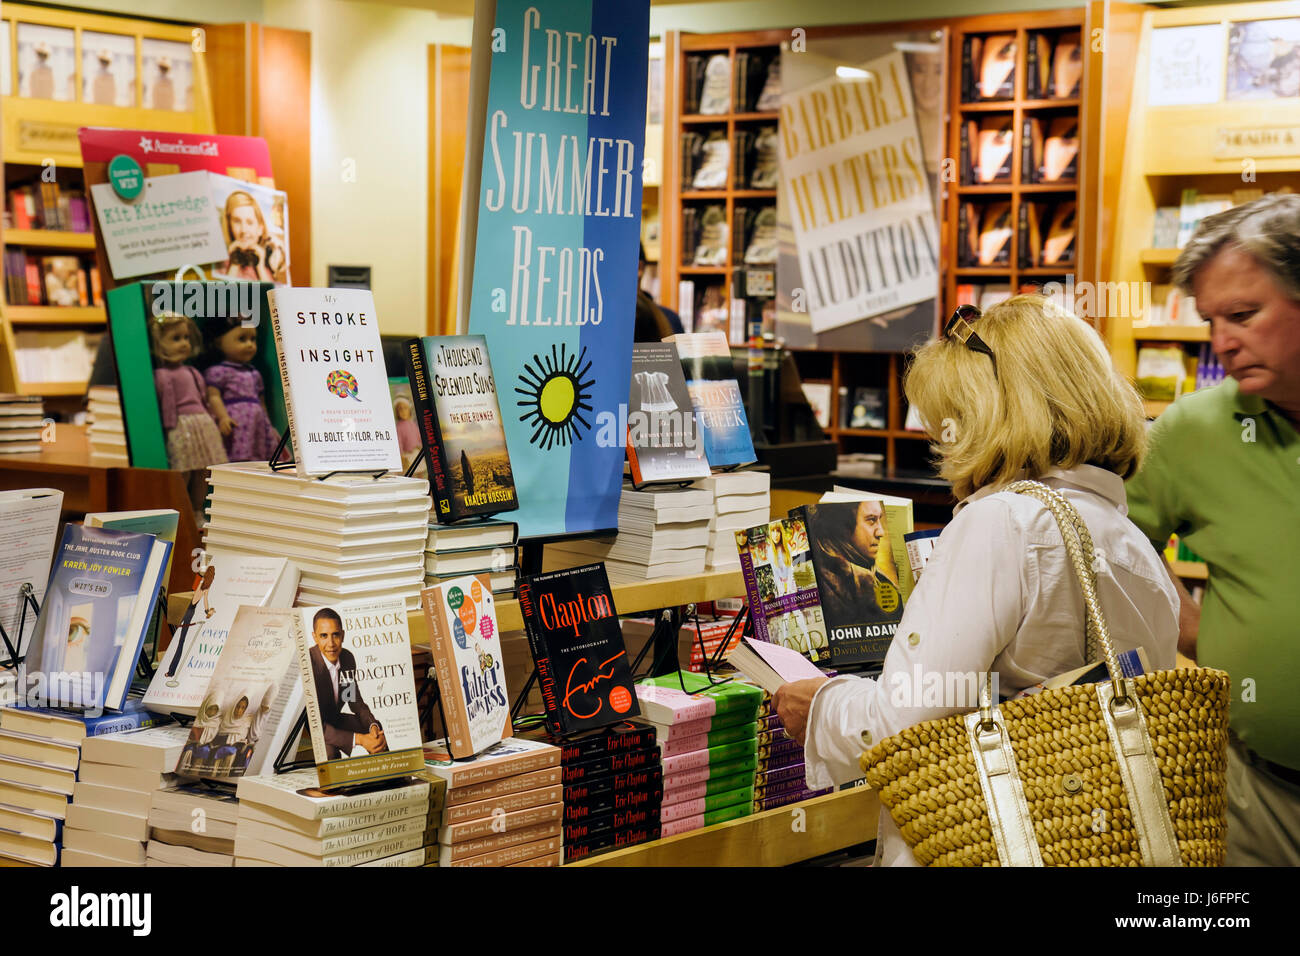 Atlanta Georgia Hartsfield-Jackson Atlanta Airport ATL woman man bookstore display bestseller business concession - Stock Image